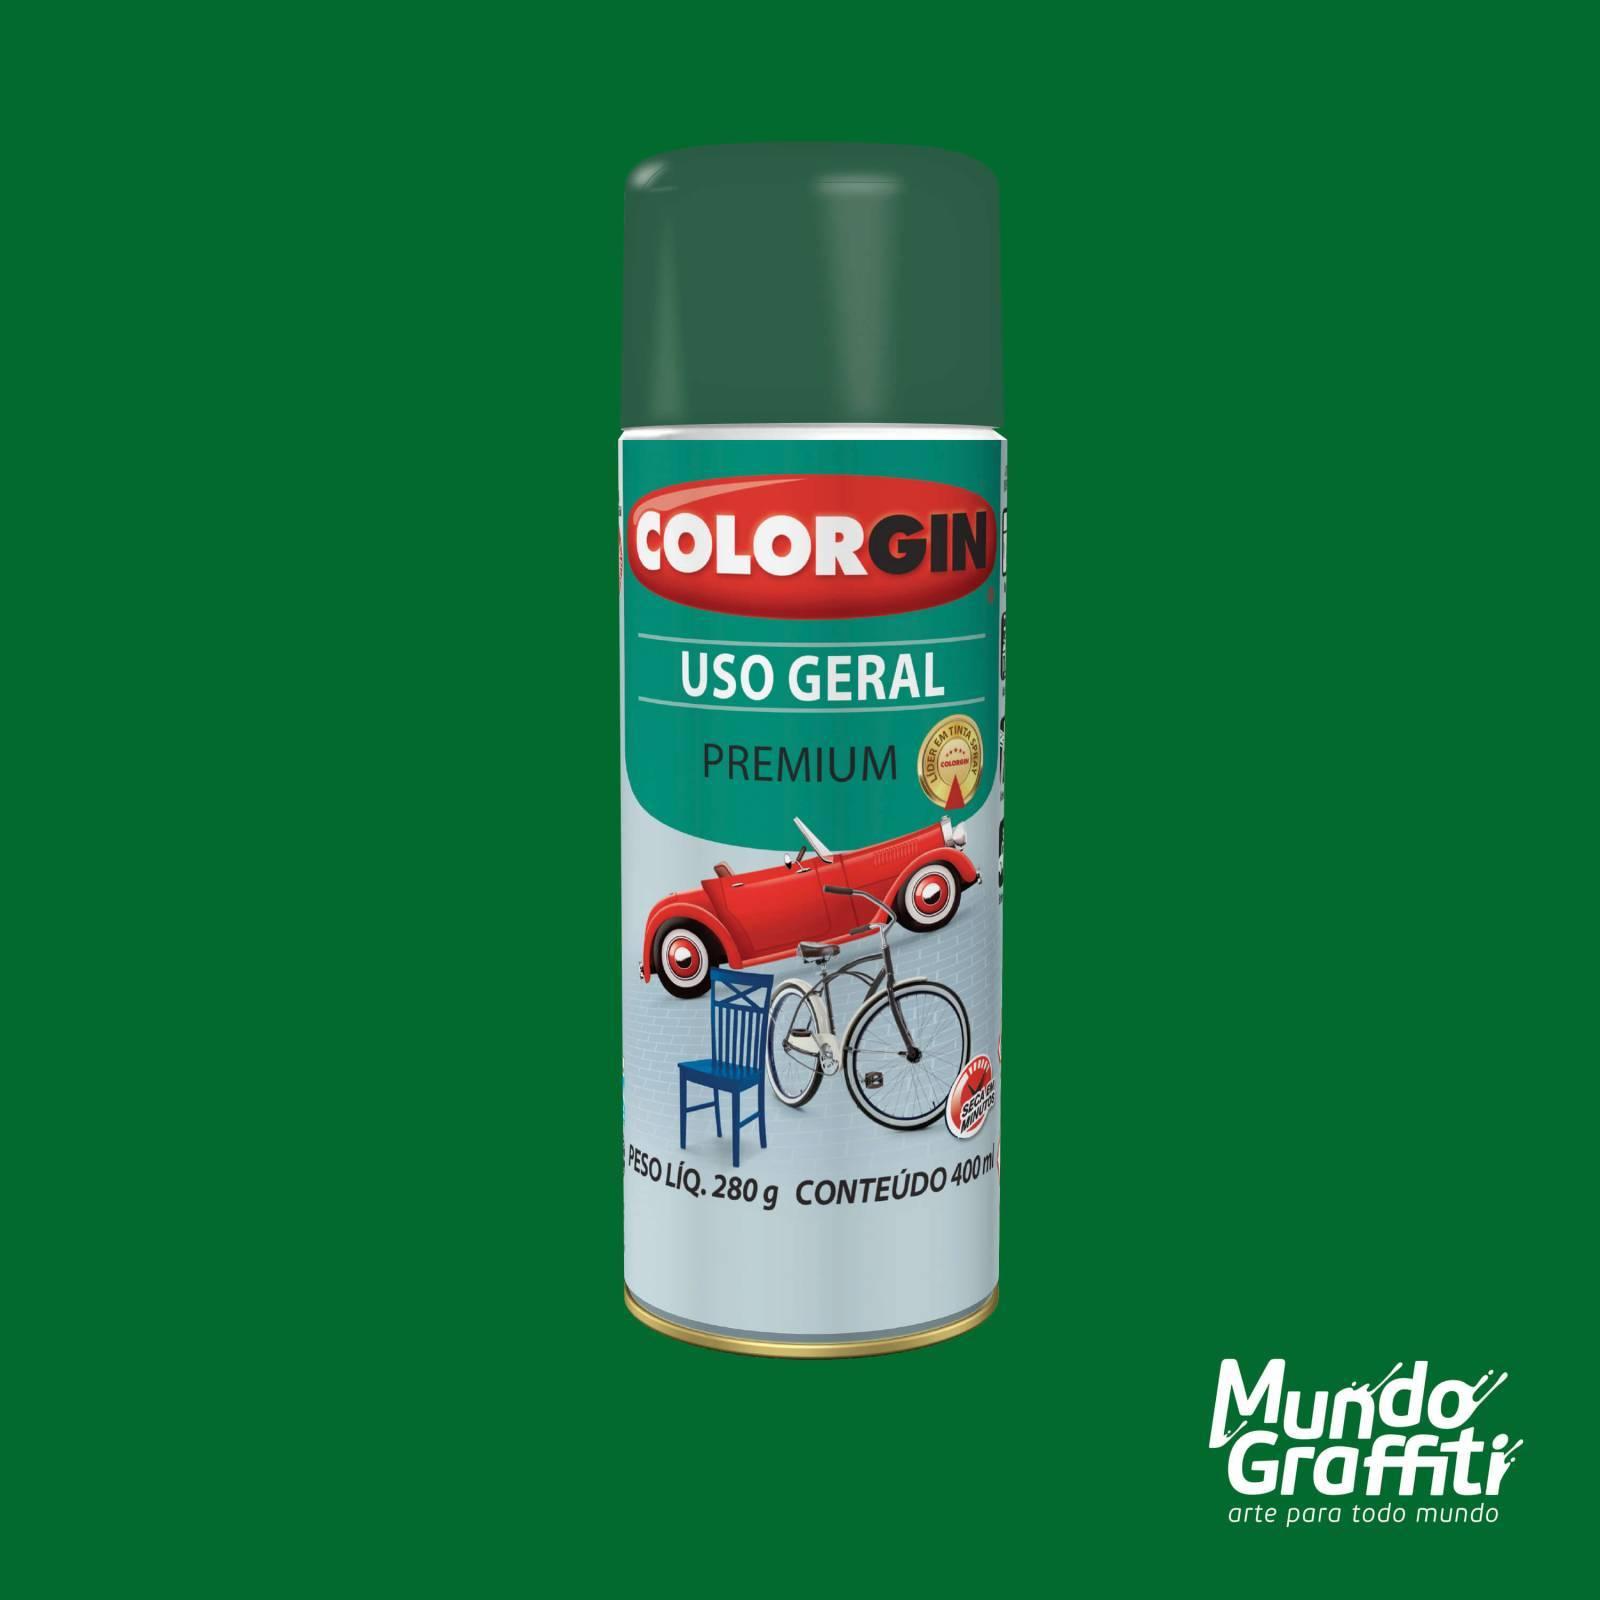 Tinta Spray Colorgin Uso Geral 54022 Verde Folha 400ml - Mundo Graffiti